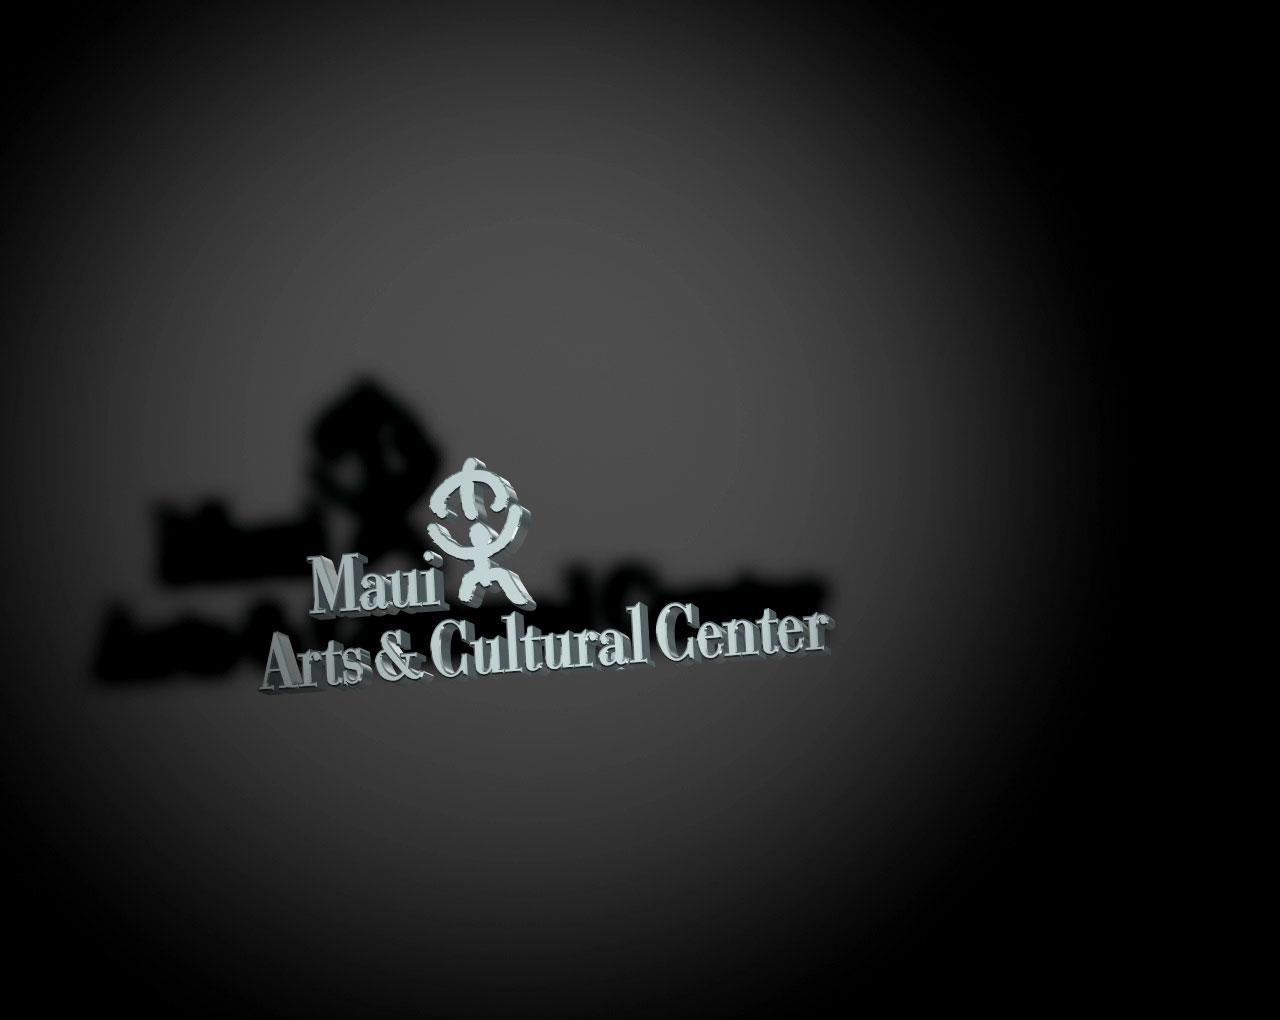 logo 3_1 (0-00-24-07).jpg